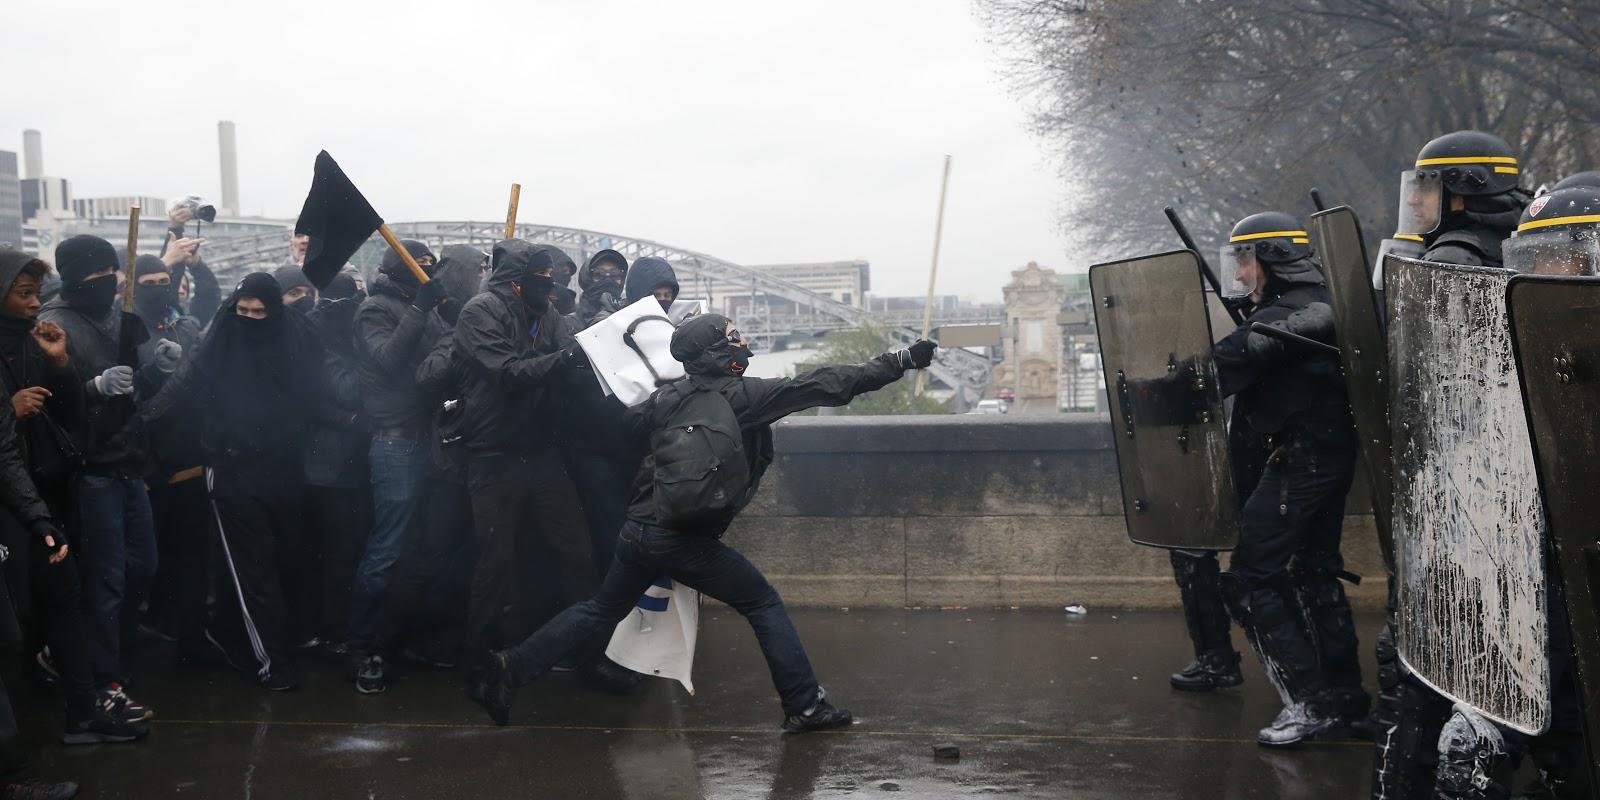 4893315_3_6040_french-riot-police-confront-protesters-during-a_99dea1efc7278685928b9ecfa7f81e53